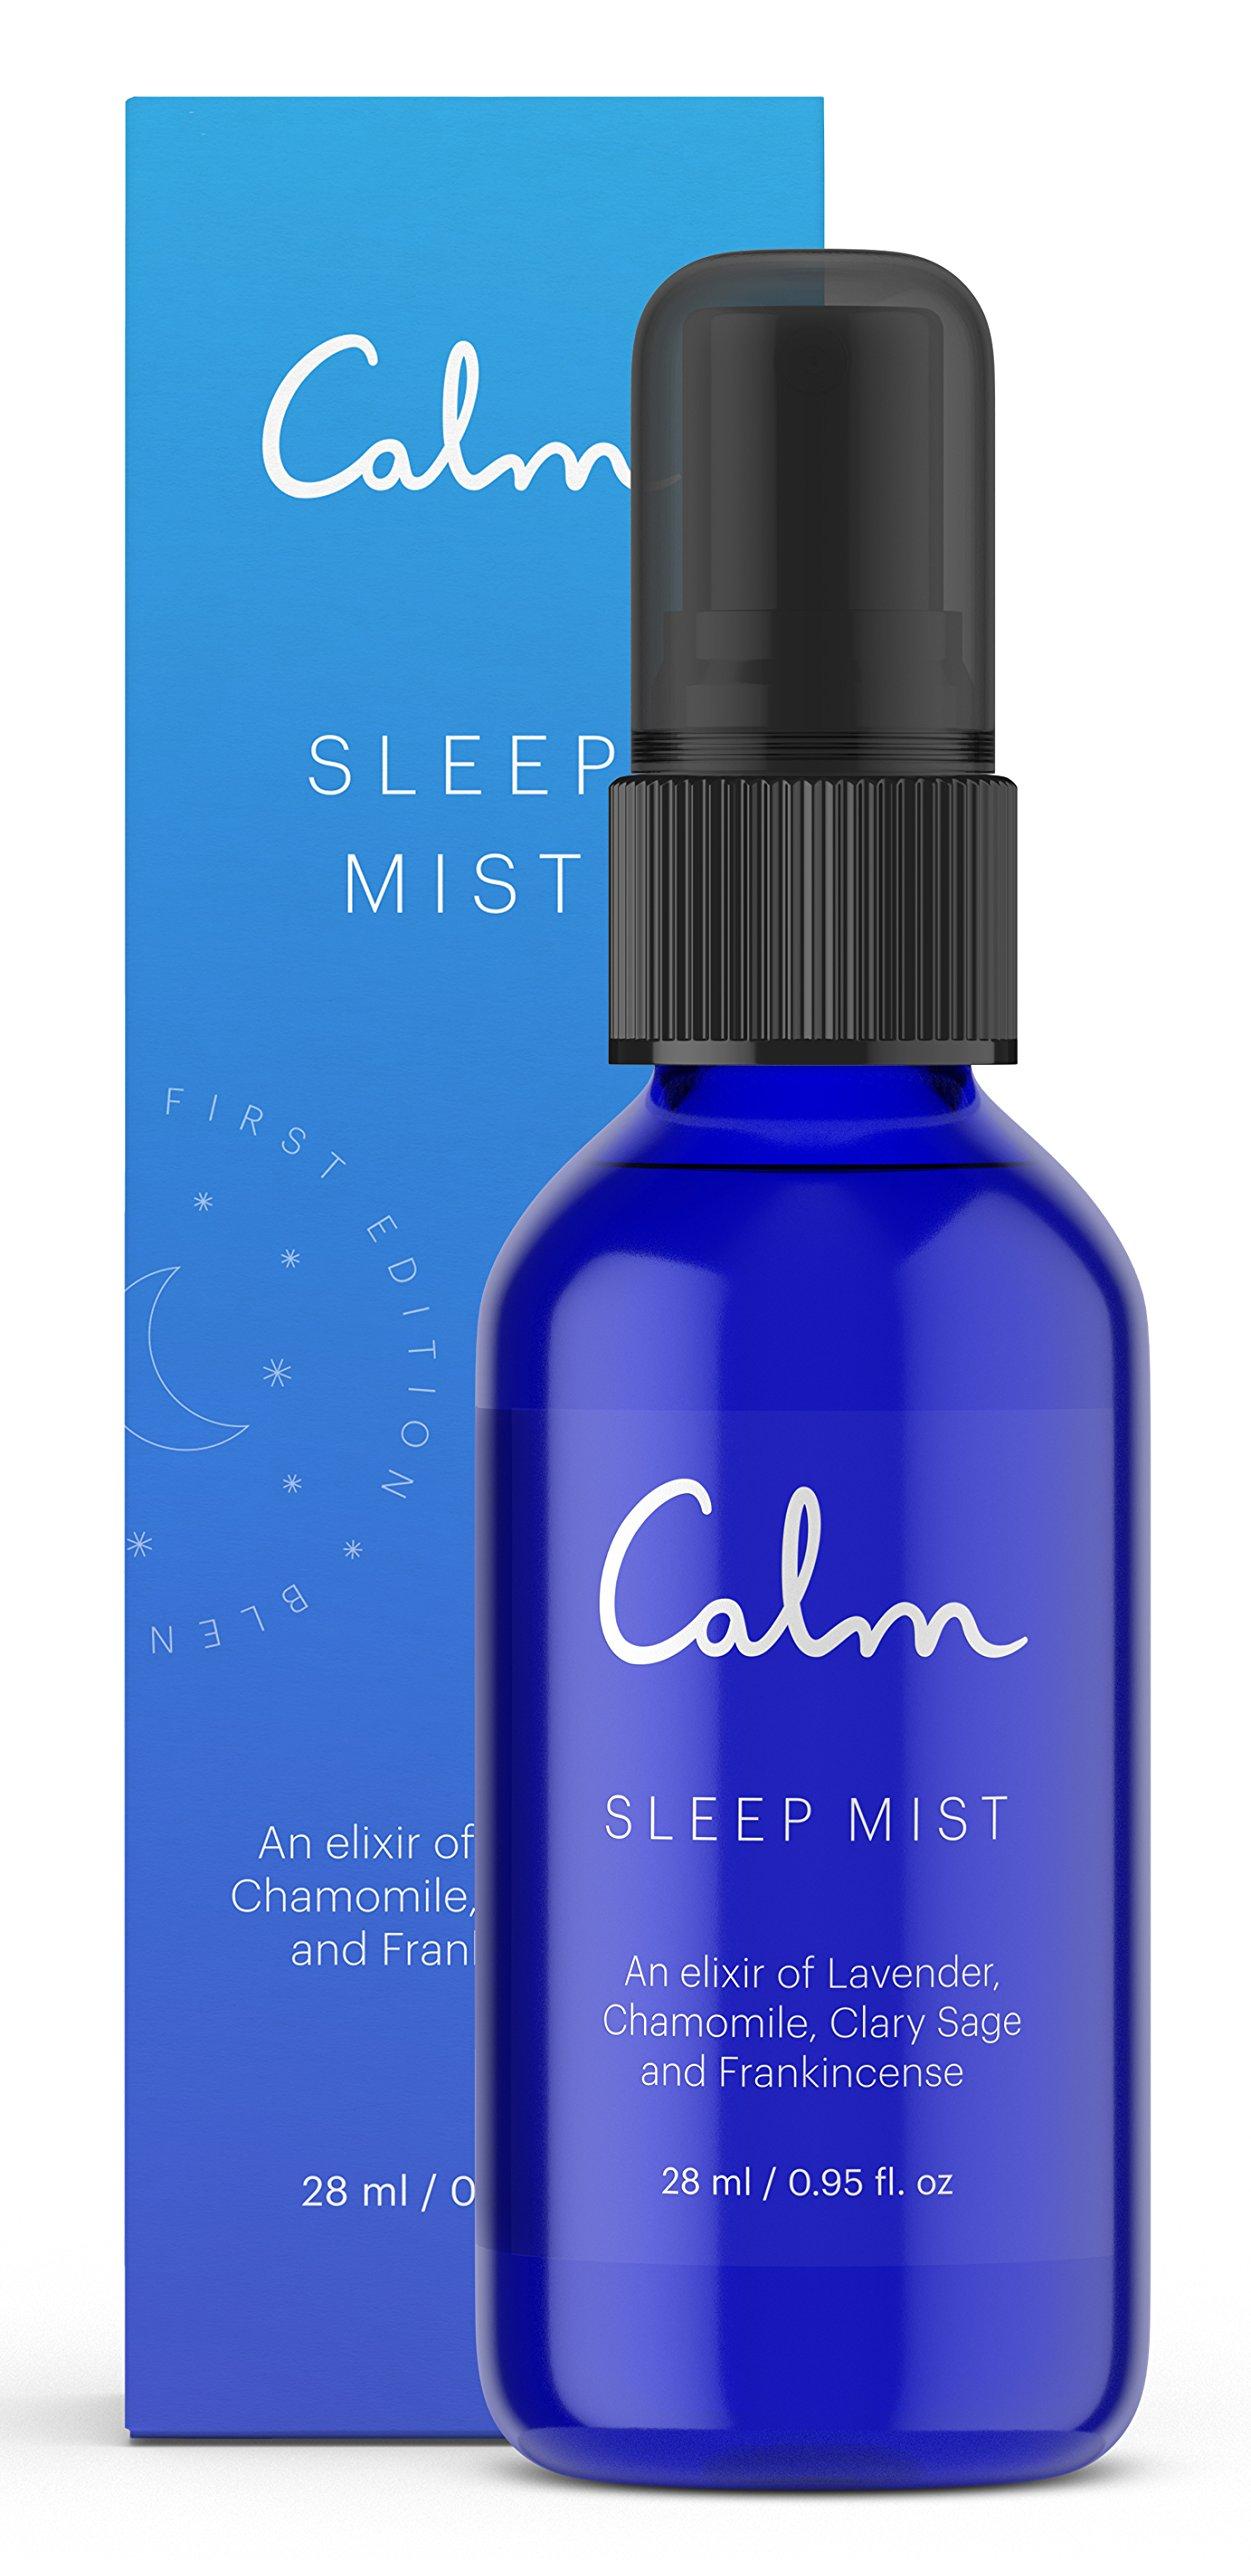 Calm Sleep Mist Pillow Spray with Essential Oils, Lavender, 28 ML by Calm